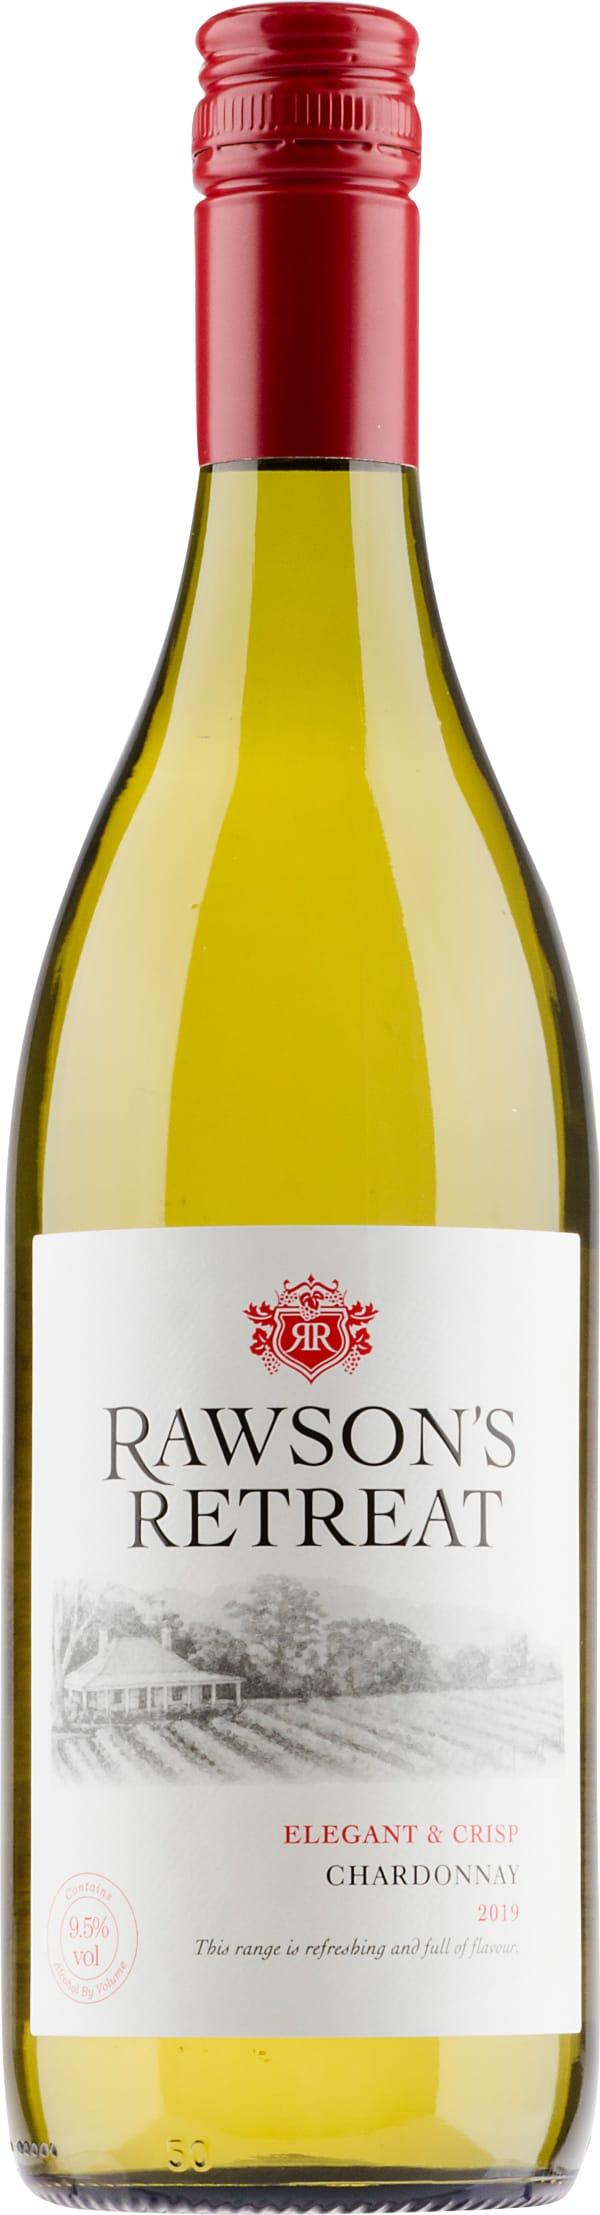 Rawson's Retreat Chardonnay 2020